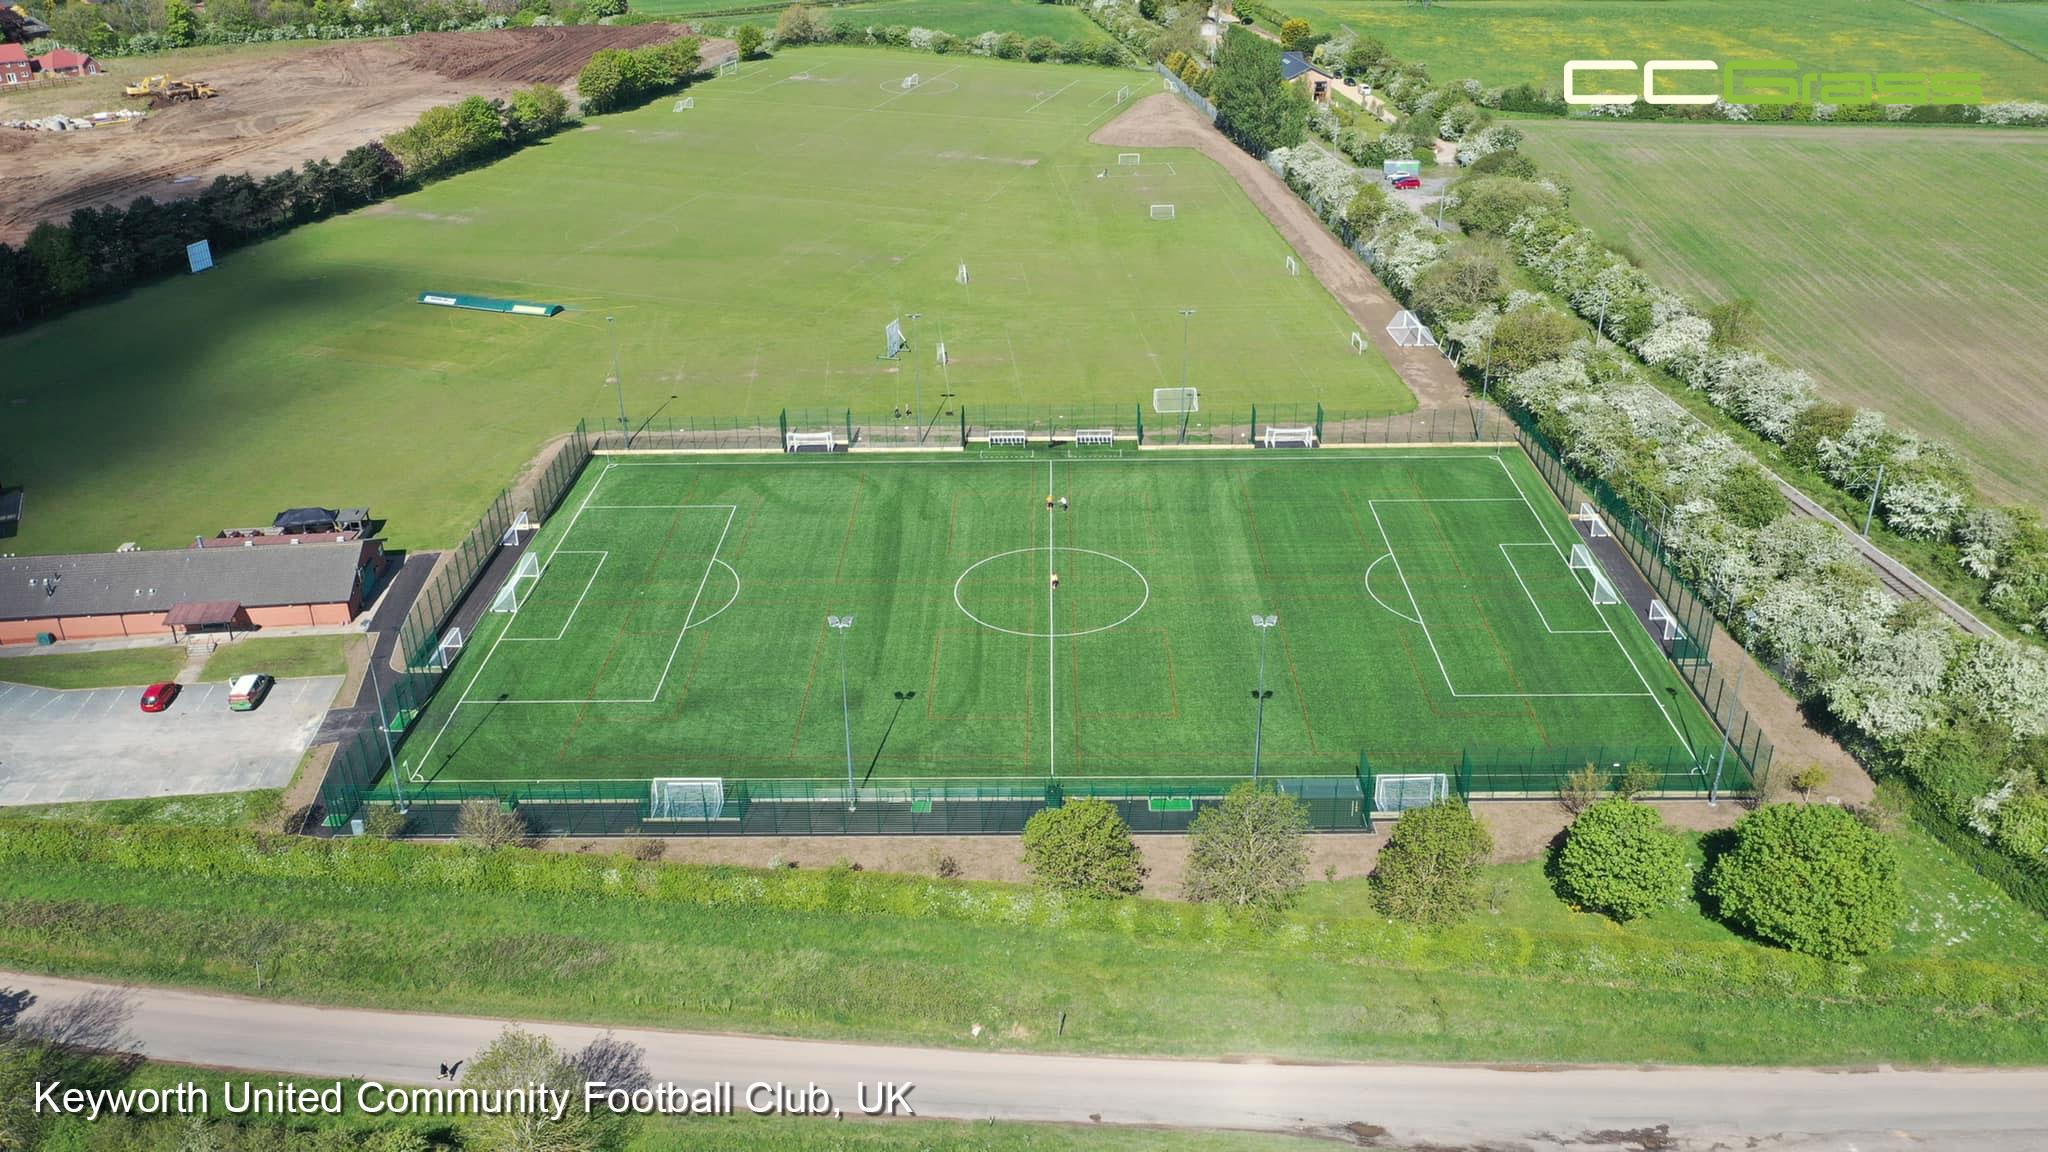 CCGrass, football pitch, Keyworth United Community Football Club, UK